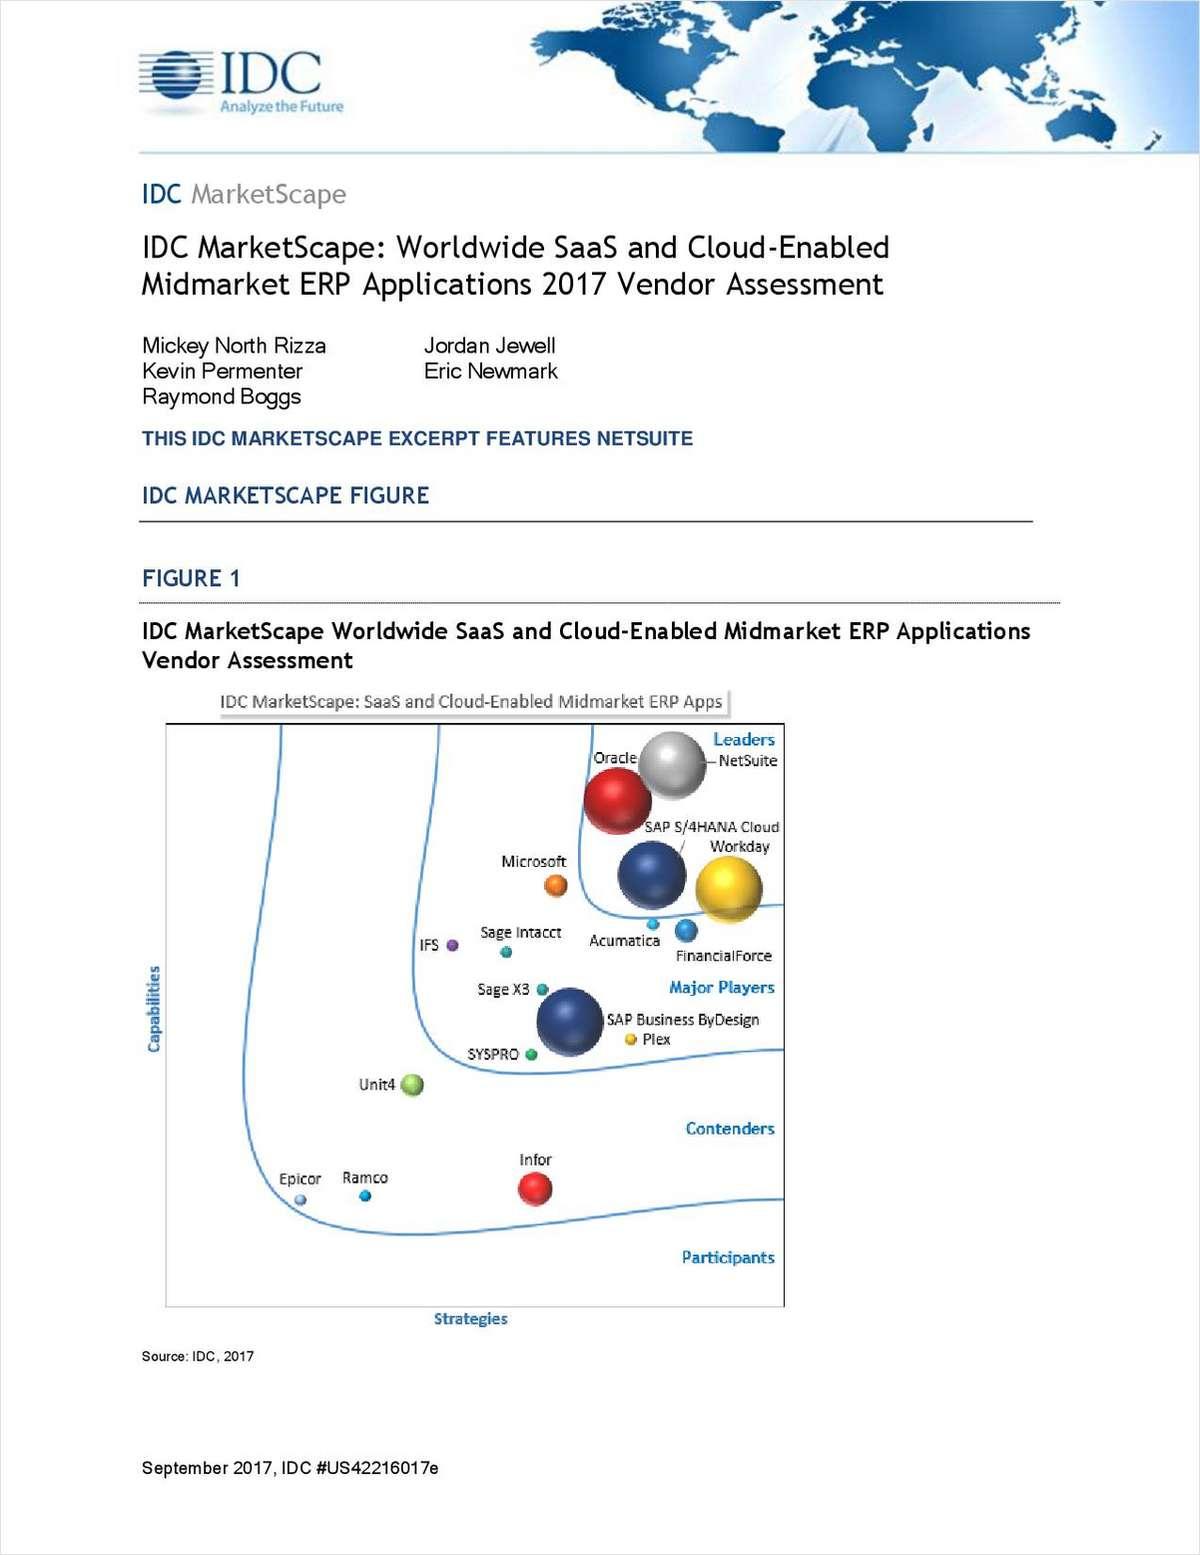 IDC MarketScape: Worldwide SaaS and Cloud-Enabled Midmarket ERP Applications 2017 Vendor Assessment